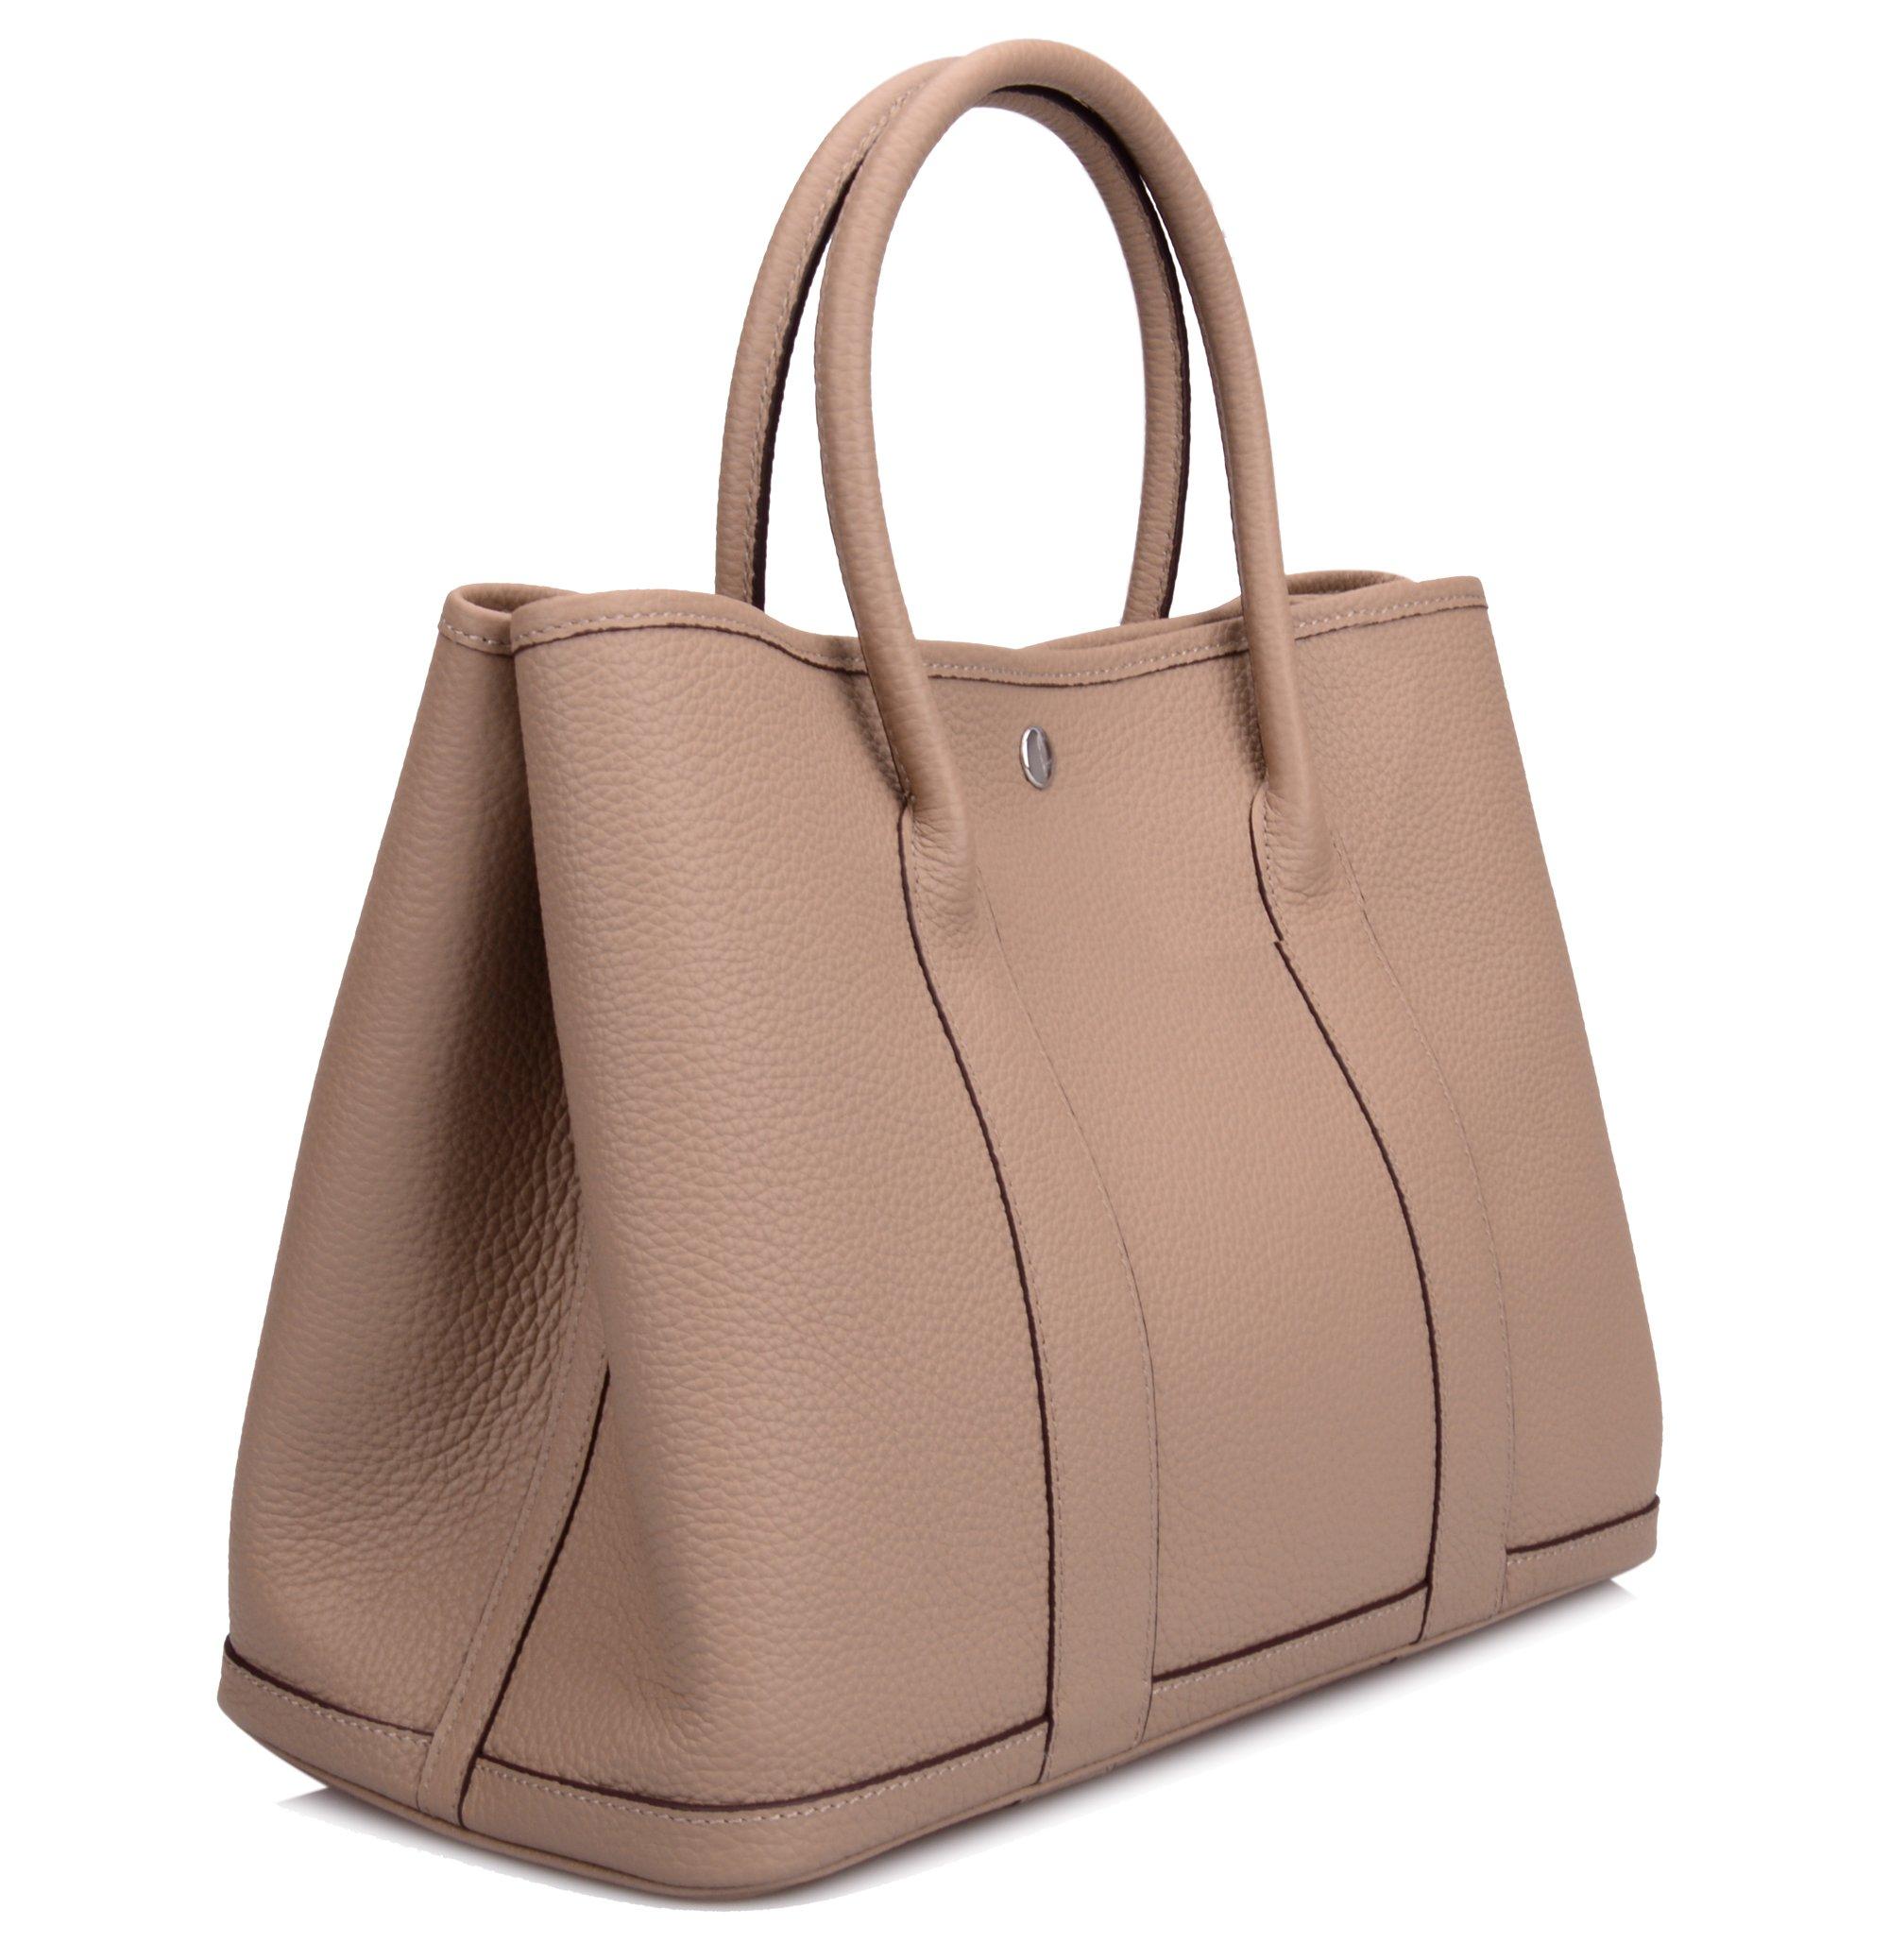 Ainifeel Women's Genuine Leather Top Handle Handbag Shopping Bag Tote Bag (Taupe)